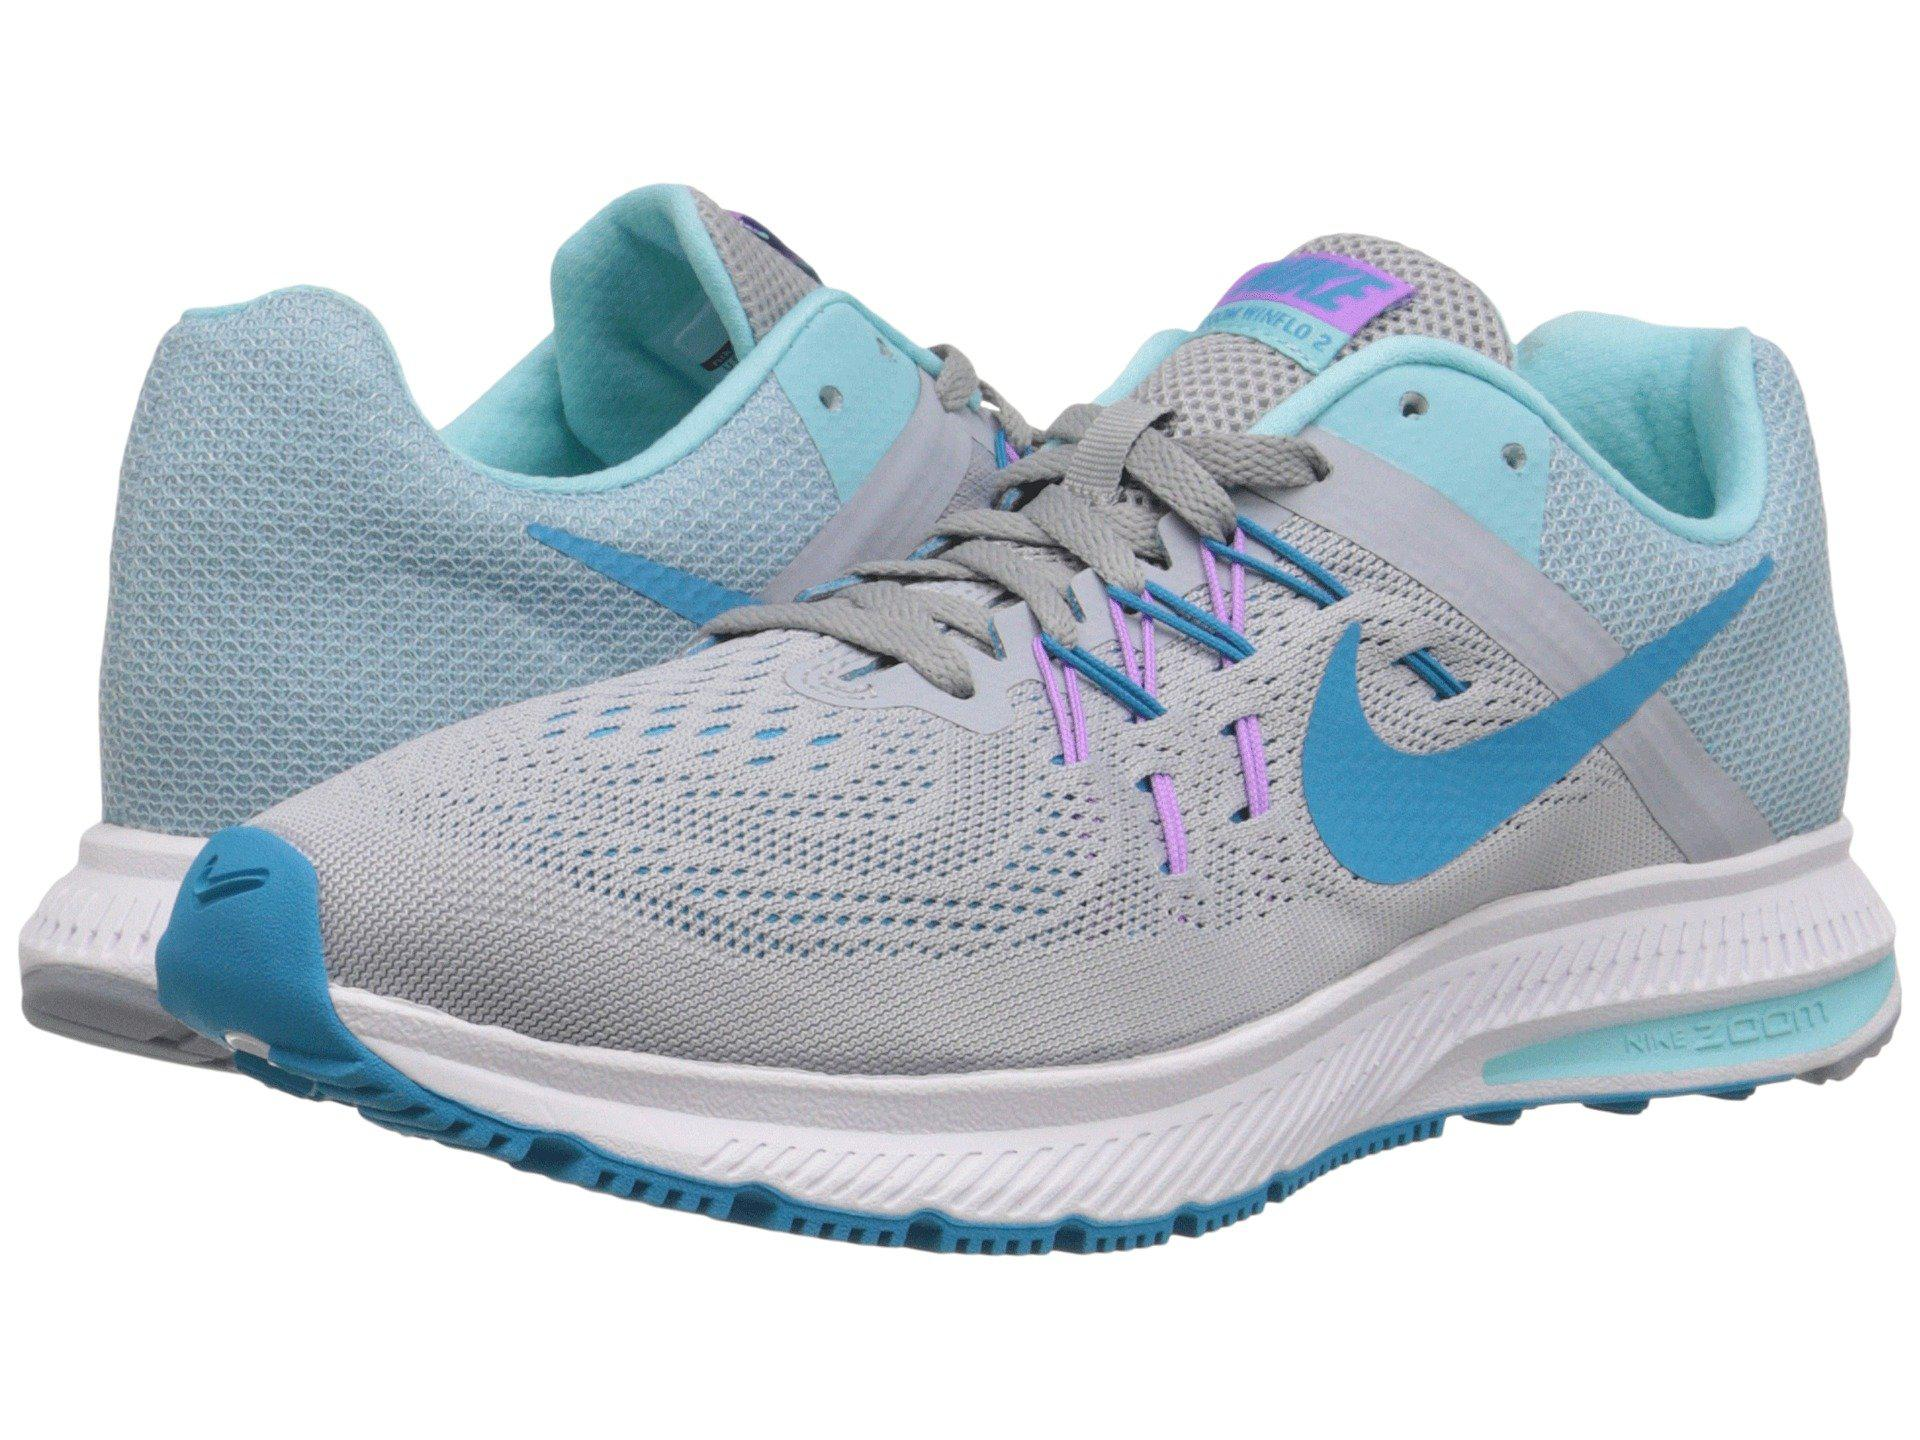 5ad81b63ae54 Lyst - Nike Zoom Winflo 2 in Blue